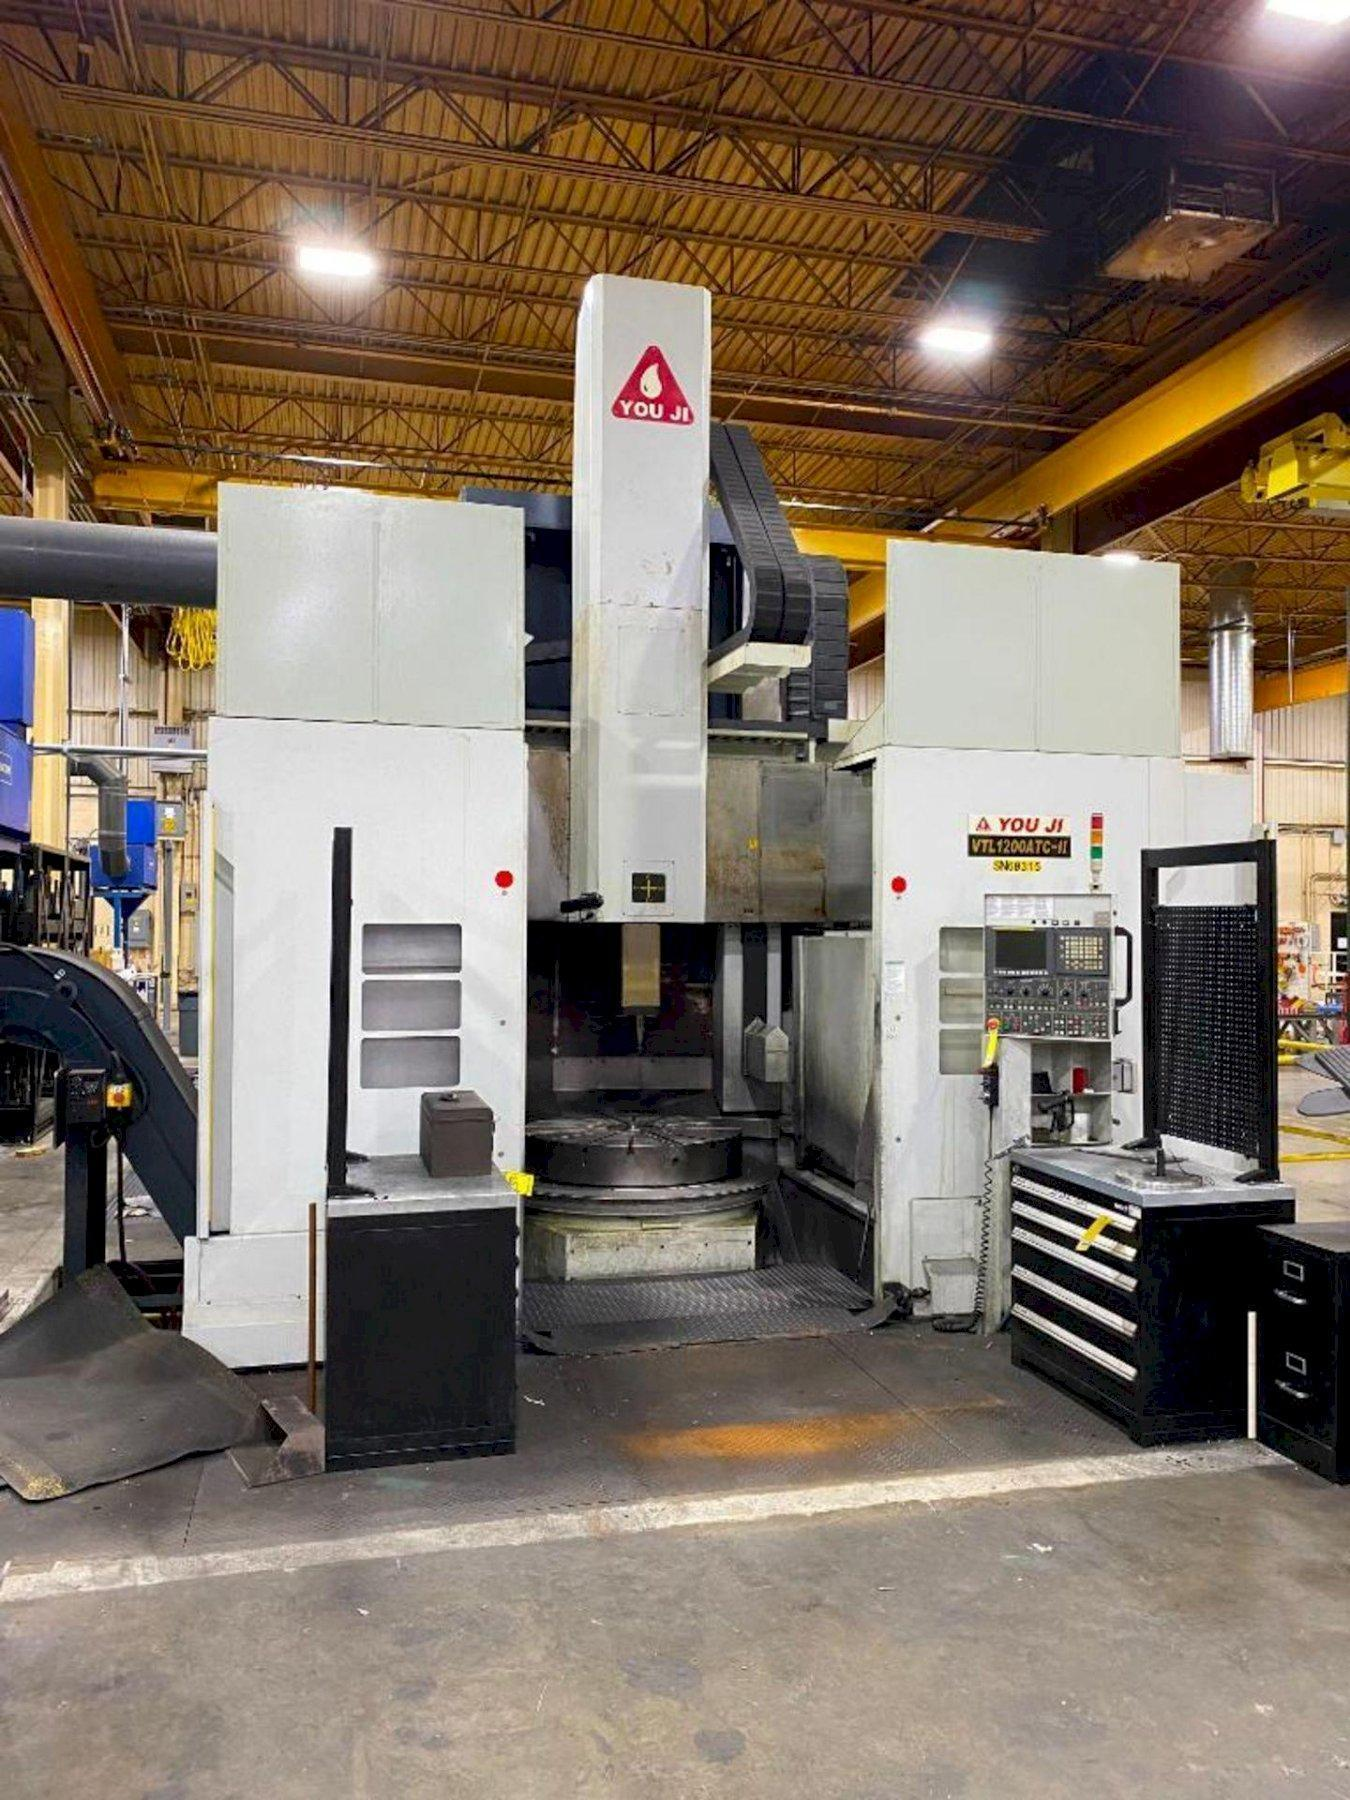 "You Ji VTL1200-II ATC CNC Vertical Lathe, Fanuc 0iTD, 63"" Swing, 49"" Table Dia, 60 HP, 12 Position Turret, High Column Machine, Gearbox, Chiller, 11K Lb Cap, 2012"